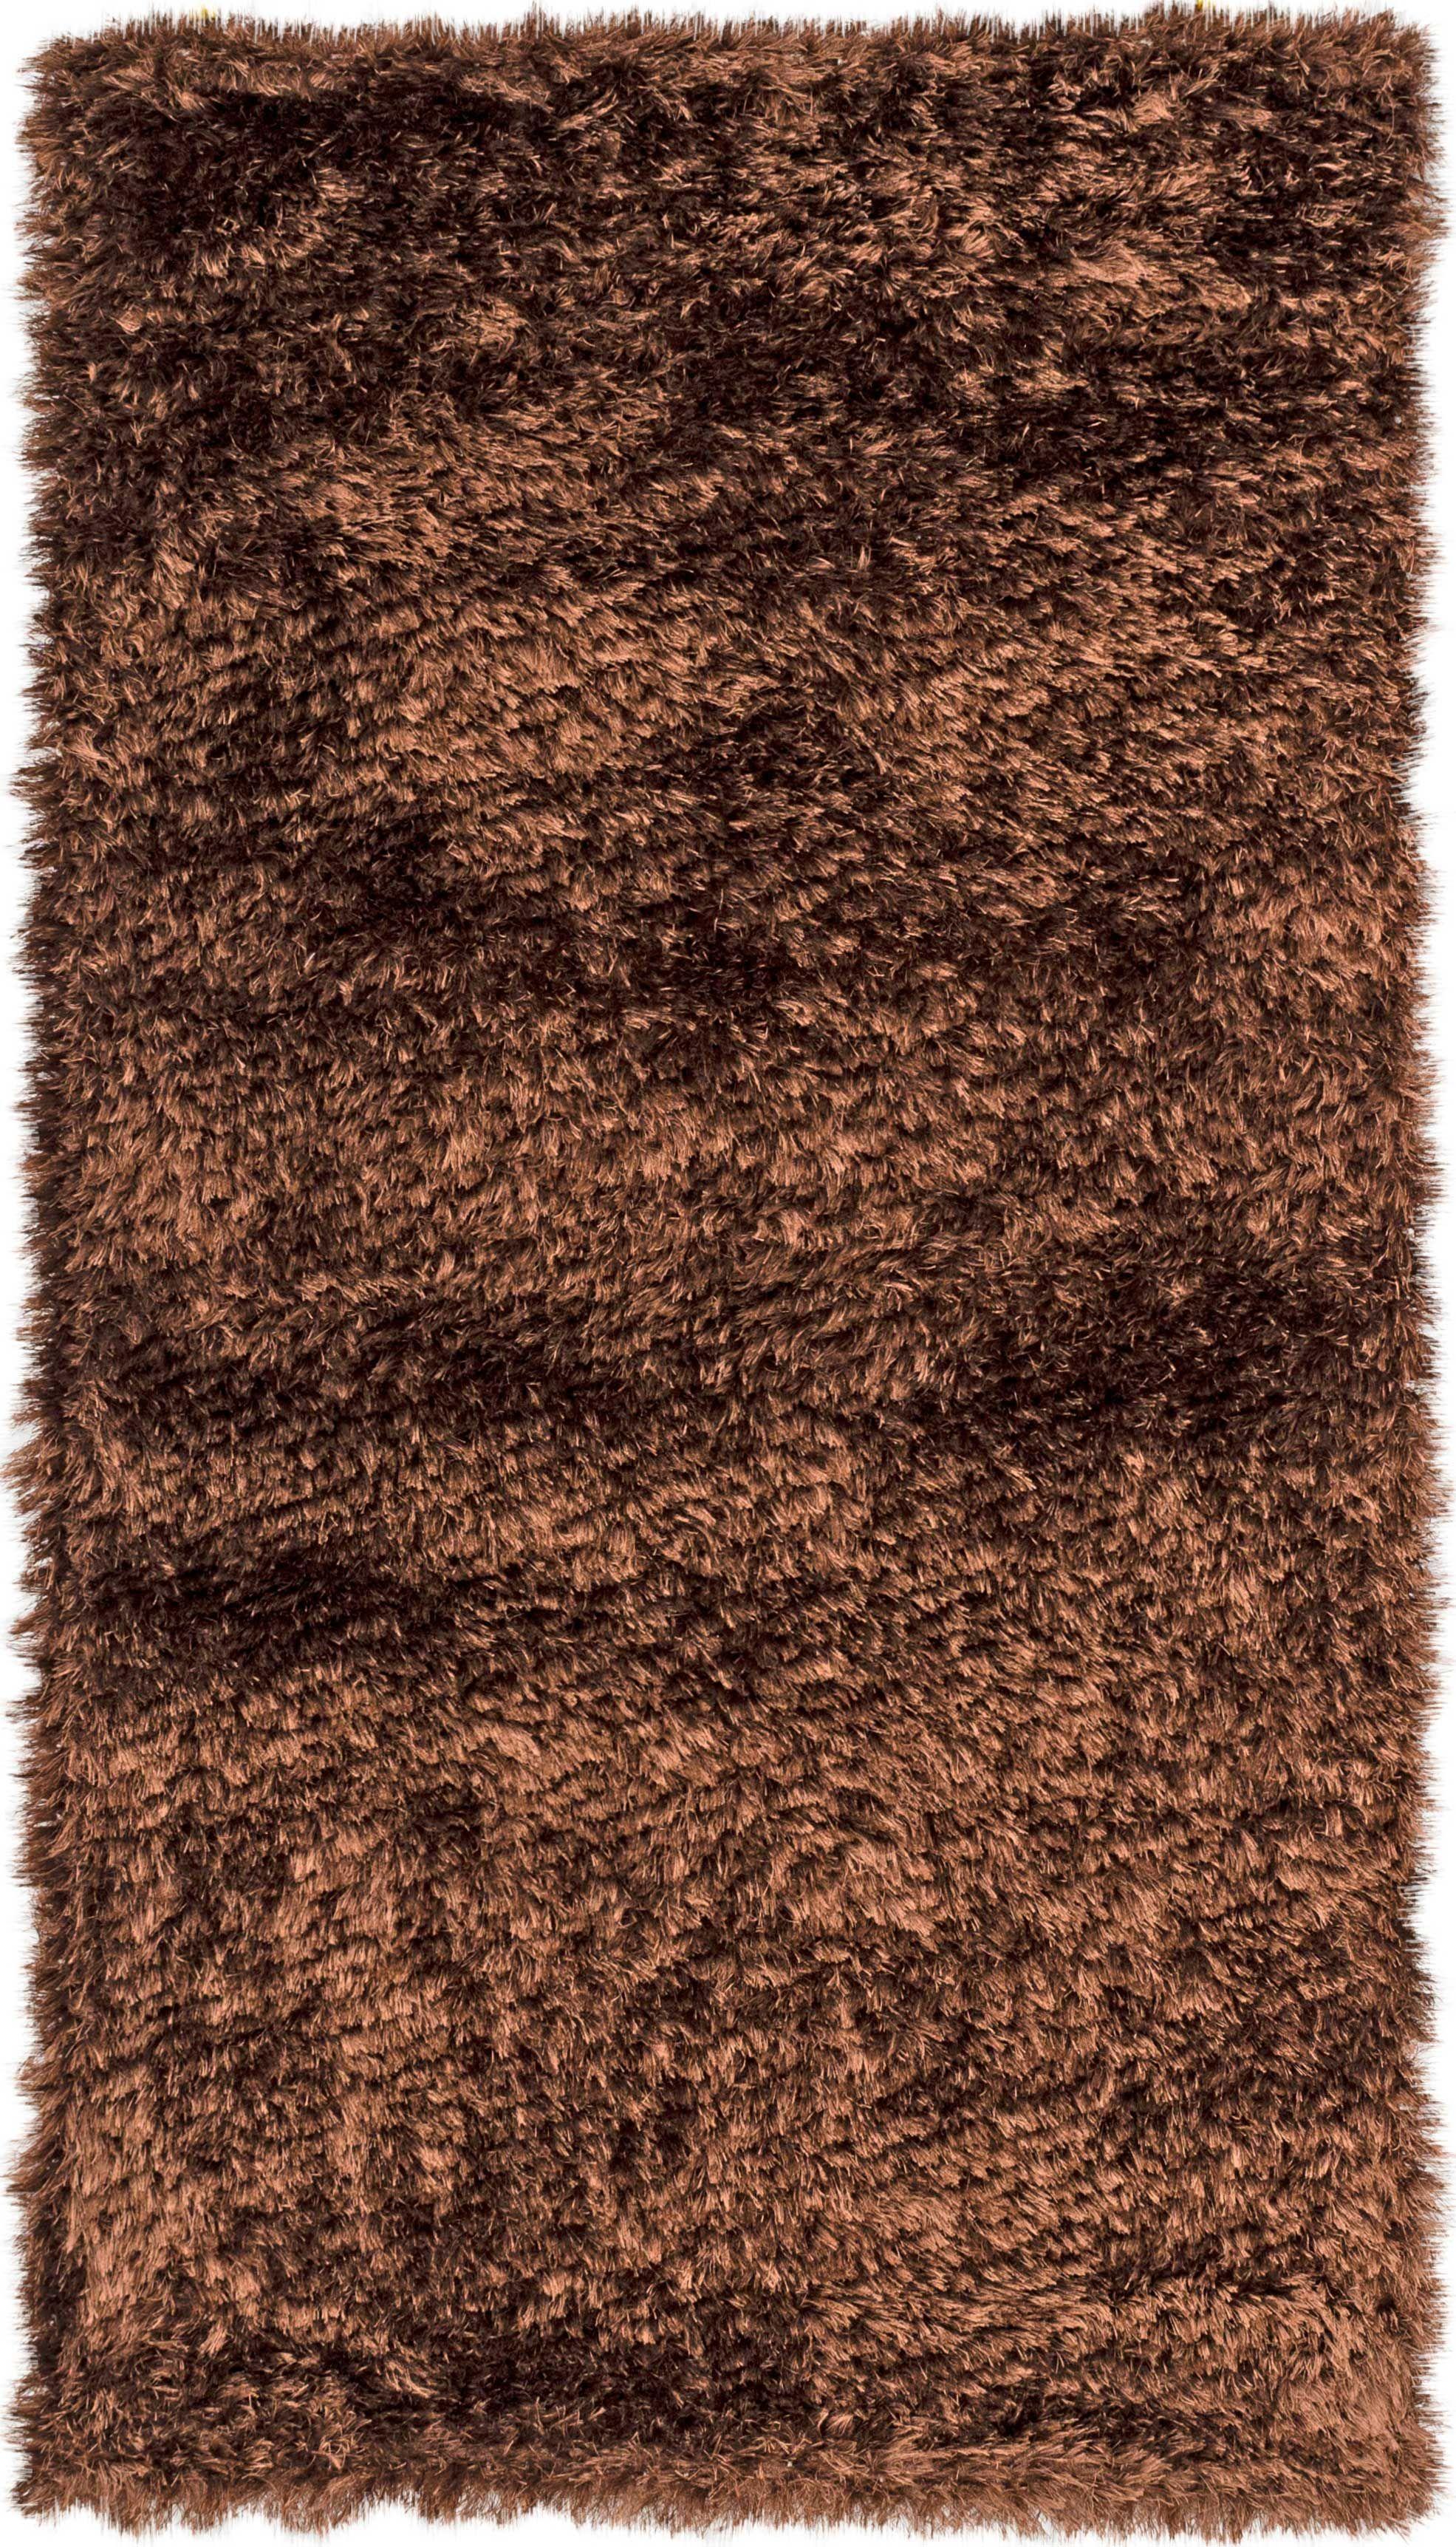 cilek shaggy medium teppich braun passend zum cilek kinderm belprogramm auf dem fluffig. Black Bedroom Furniture Sets. Home Design Ideas